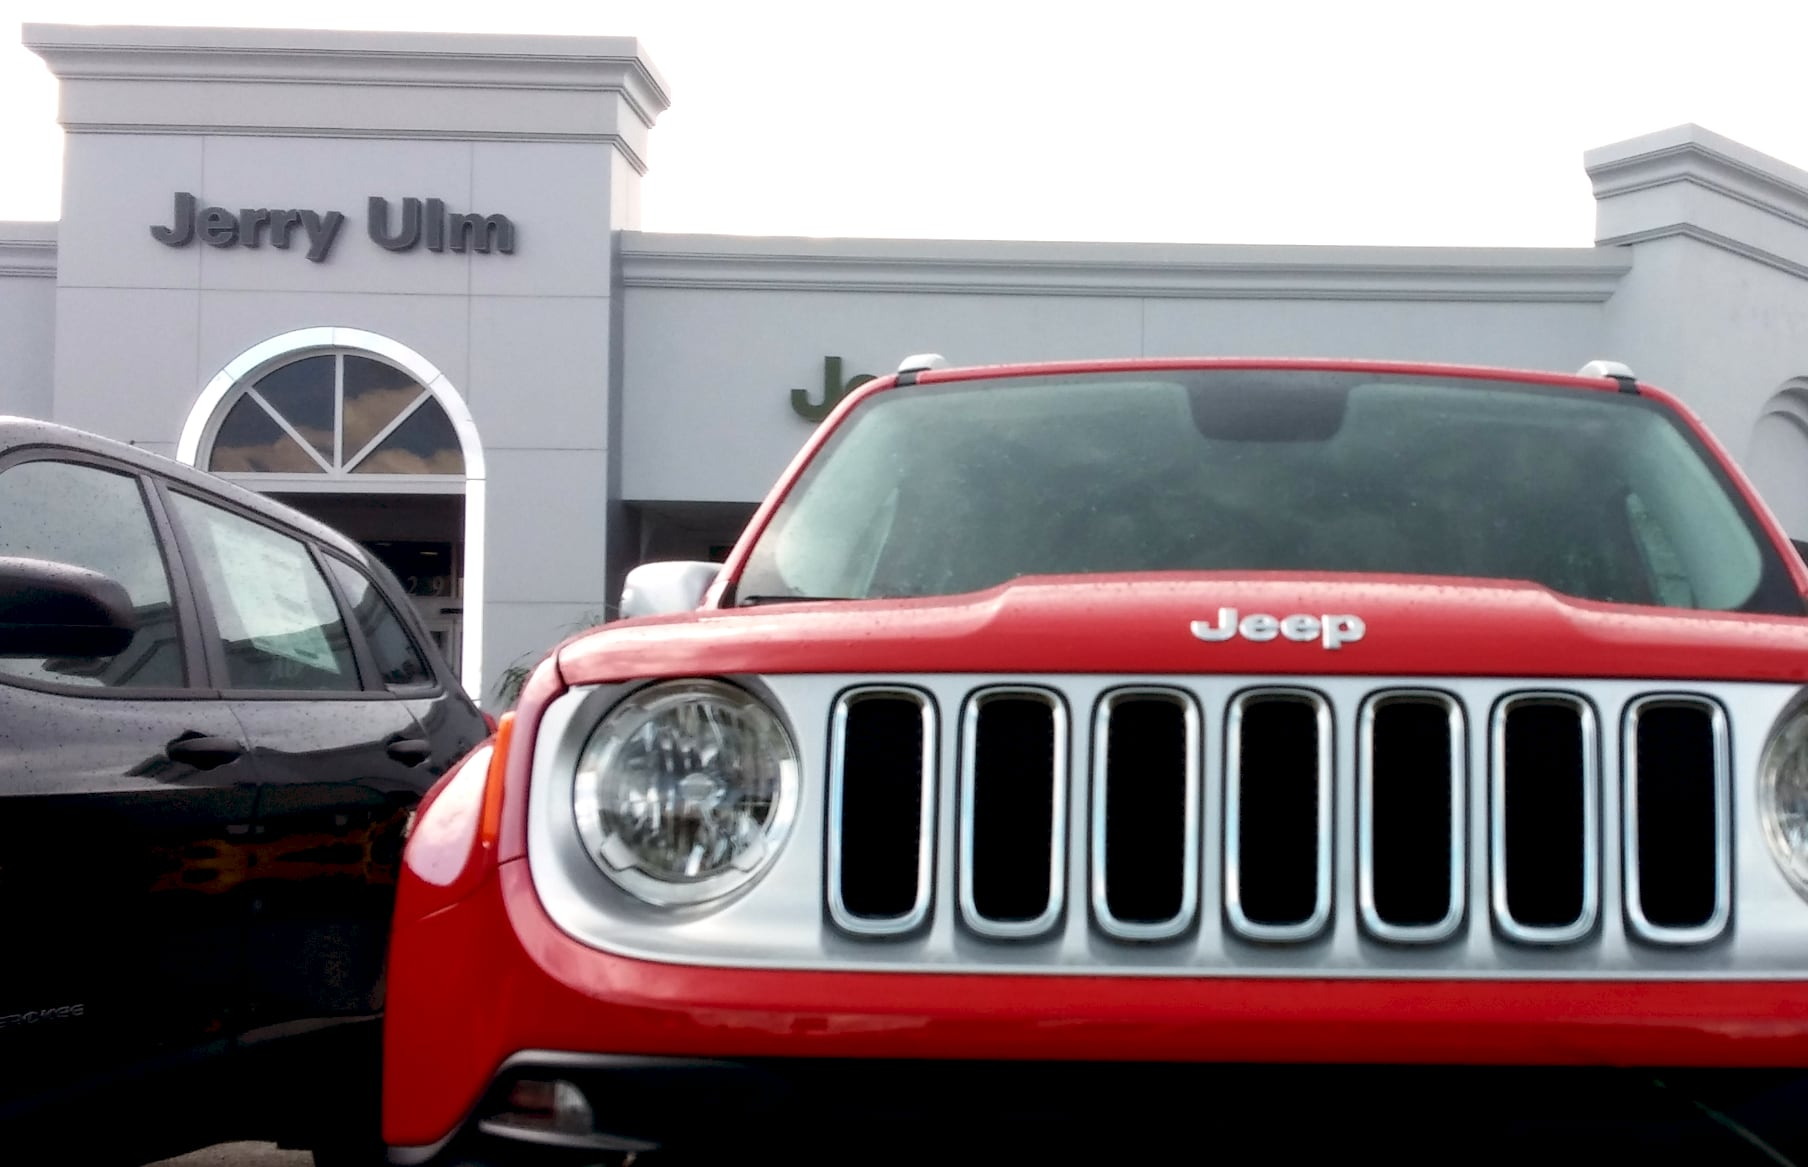 Dodge Dealership El Paso >> Jerry Ulm Dodge Collision Center | 2018 Dodge Reviews